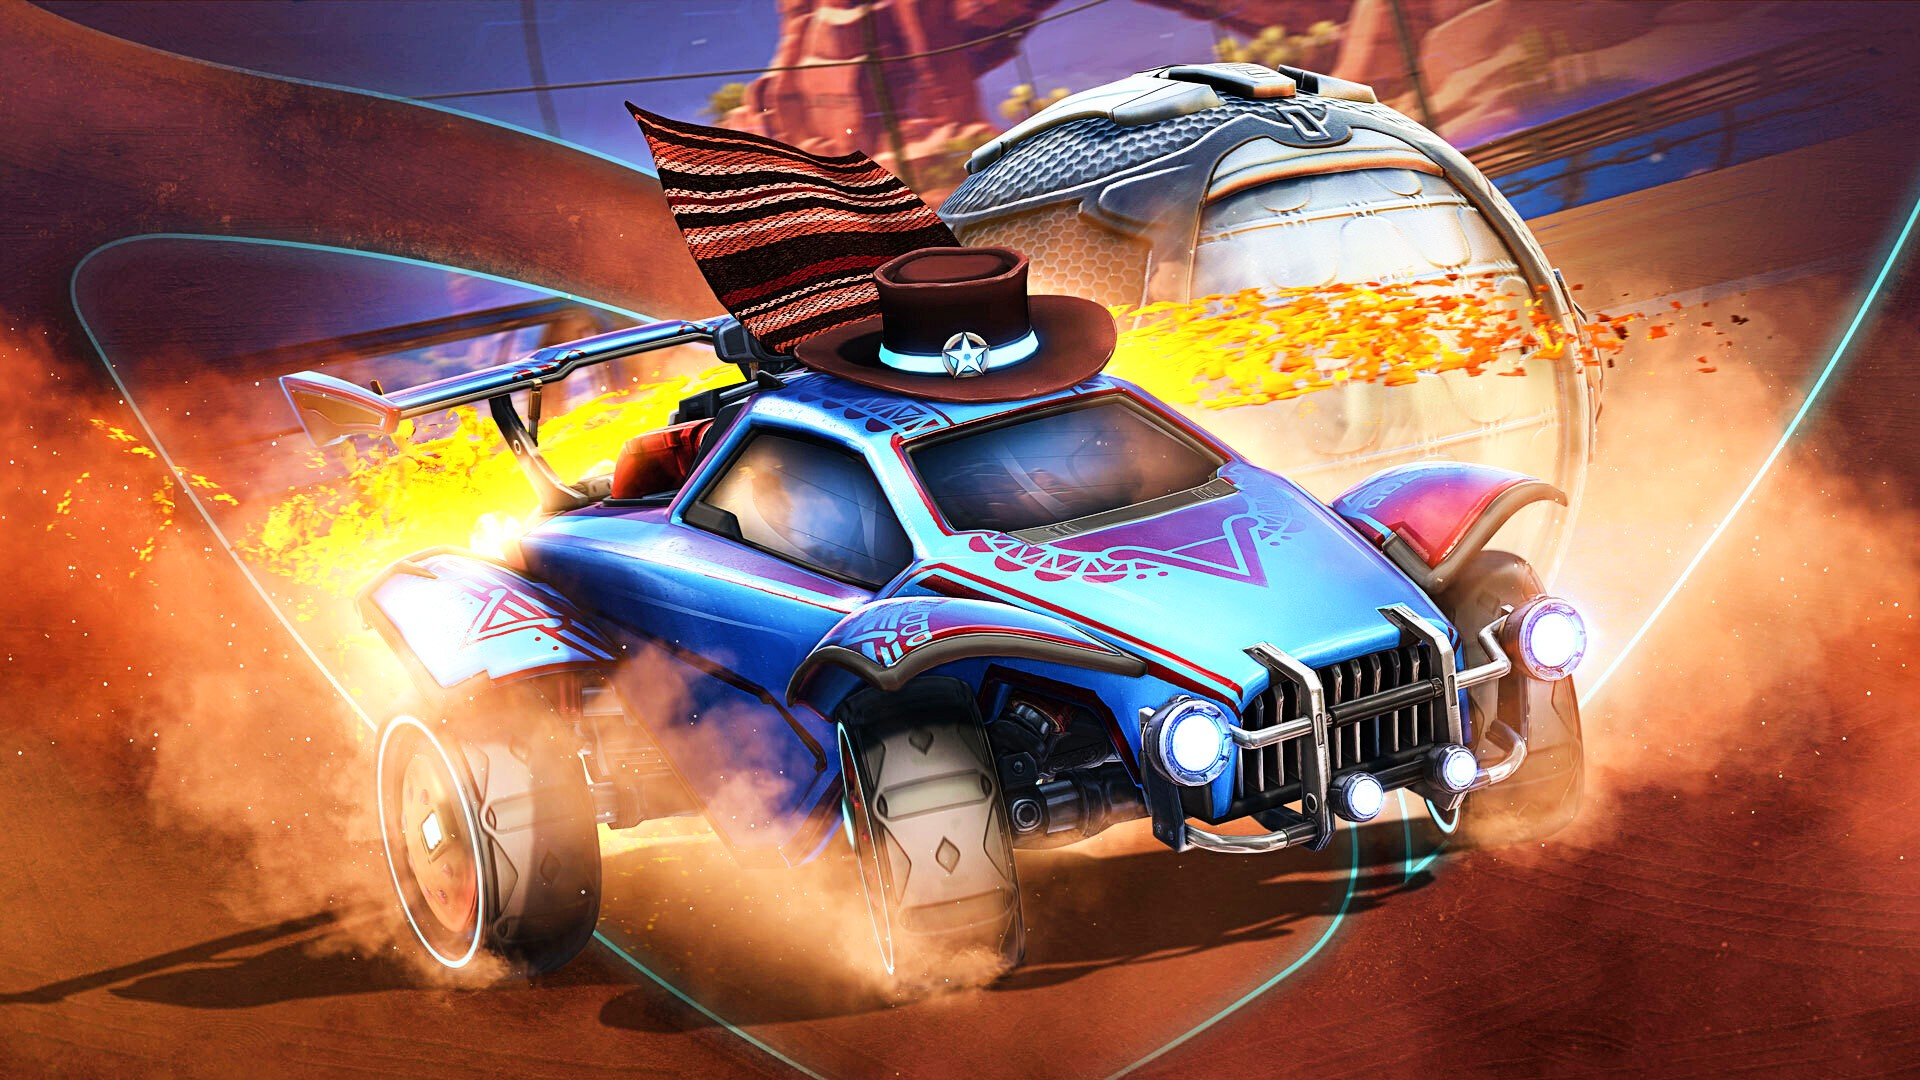 Rocket League Season 4 kicks off this week